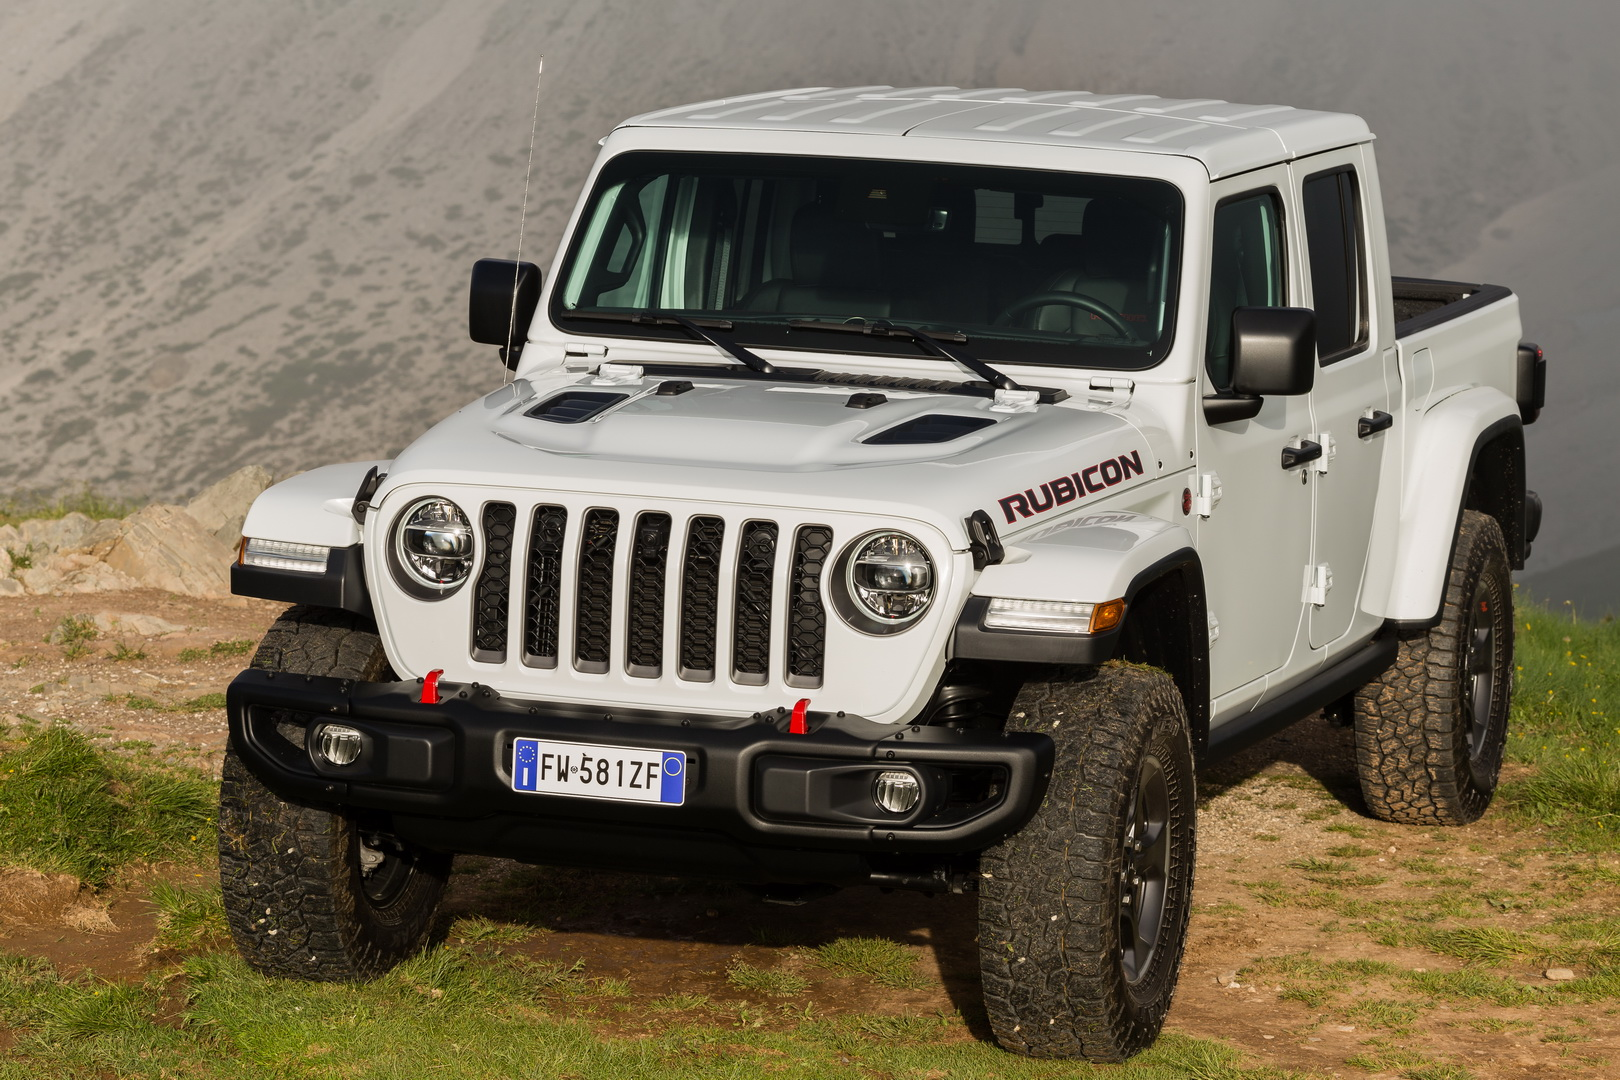 Jeep Gladiator chega à Europa em 2020 com motor V6 diesel